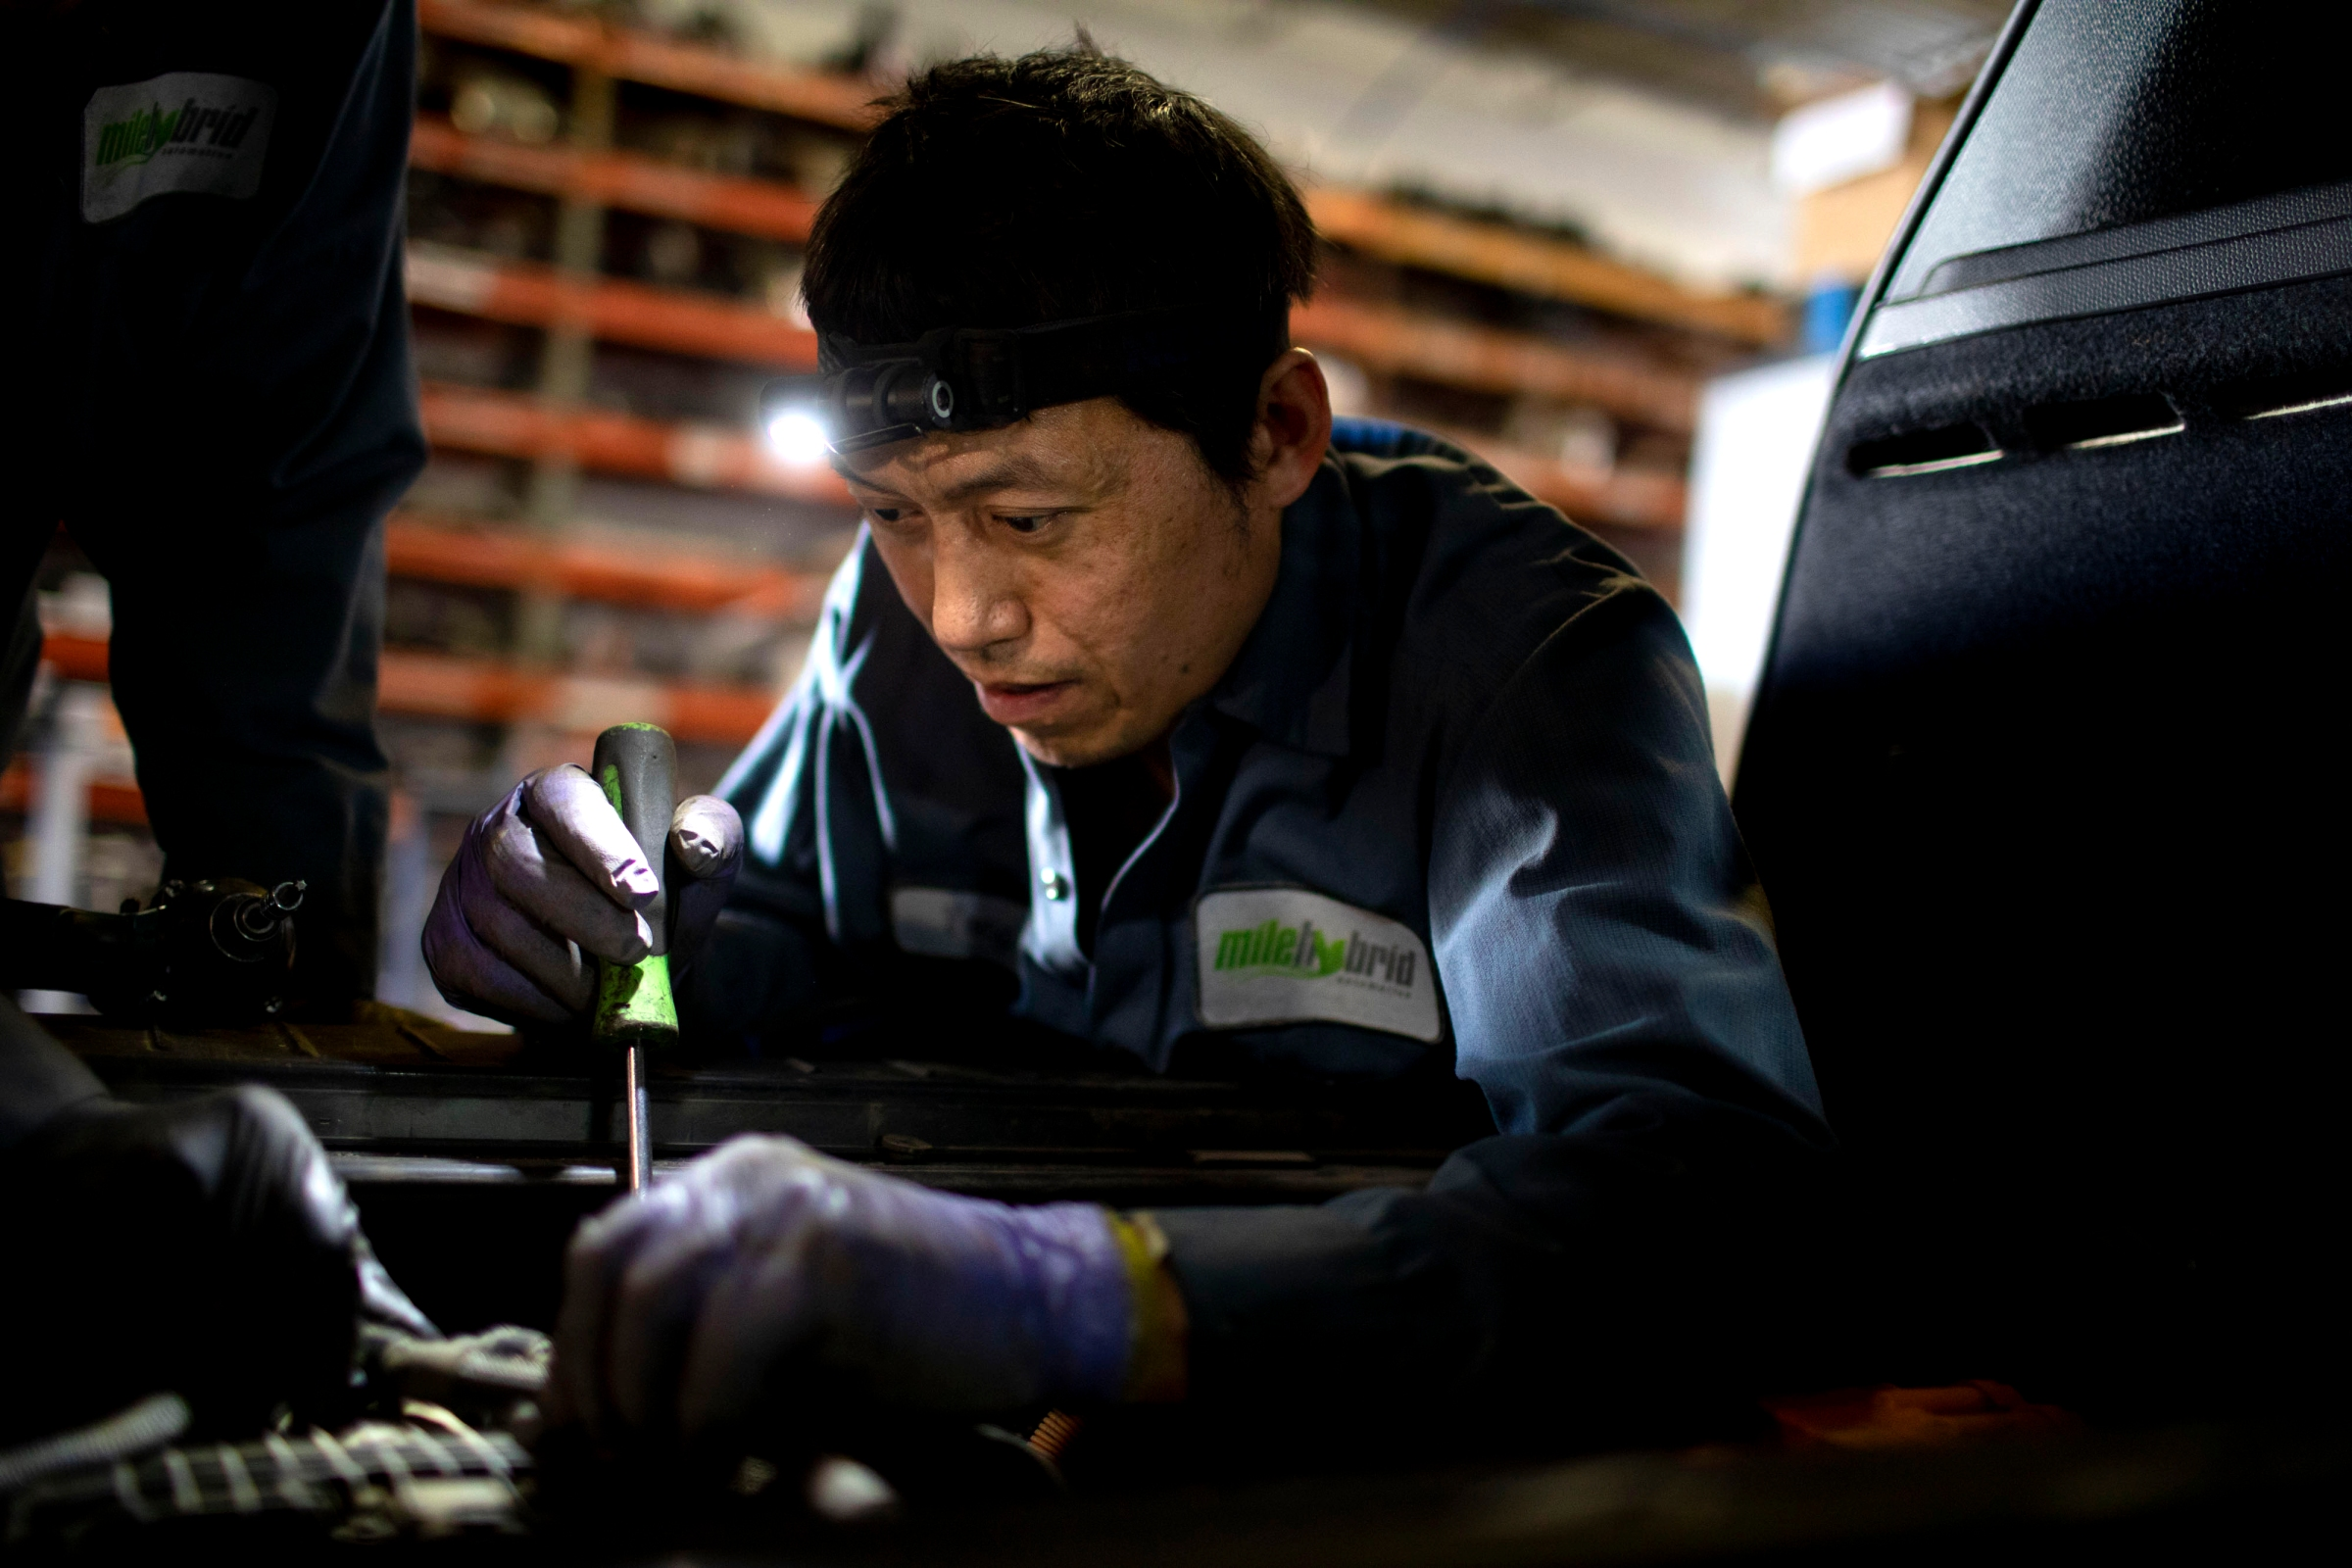 A technician dissembles an EV battery compartment.